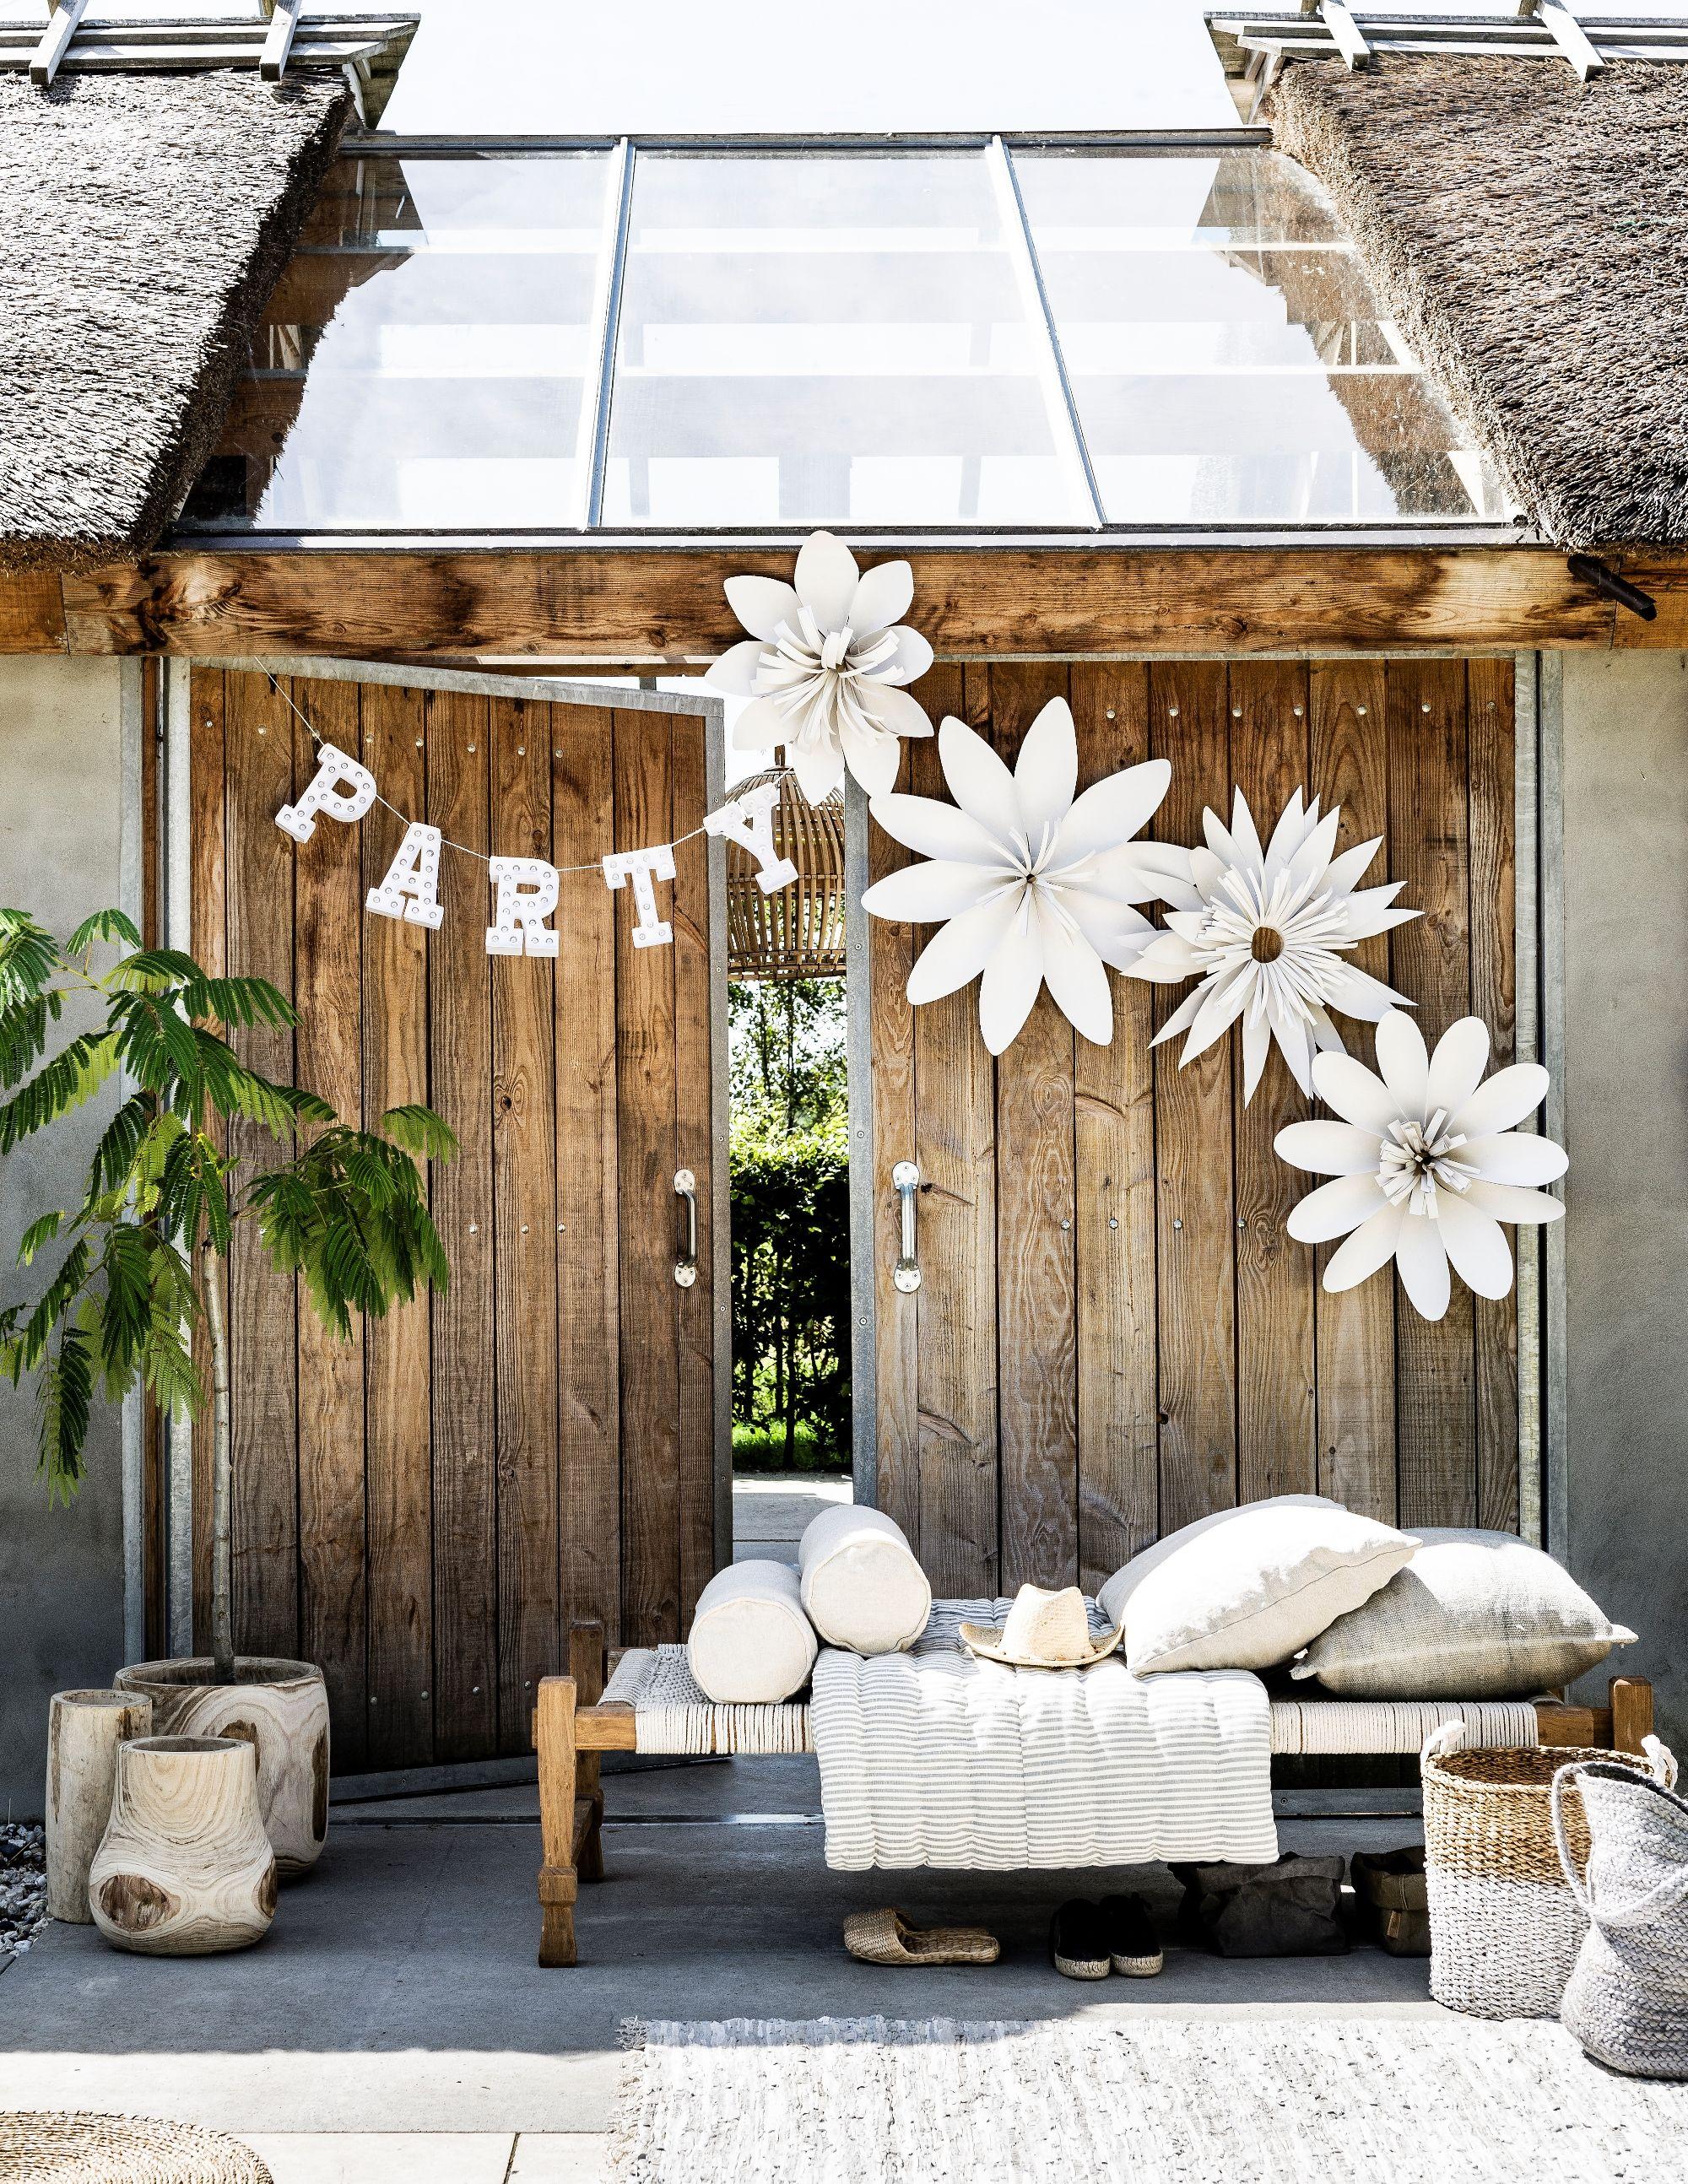 decoration for summer party | feestelijke bloemendecoratie | Photography Sjoerd Eickmans | Styling Gieke van Lon (humade.nl) and Lotte Dekker | vtwonen 05-2016